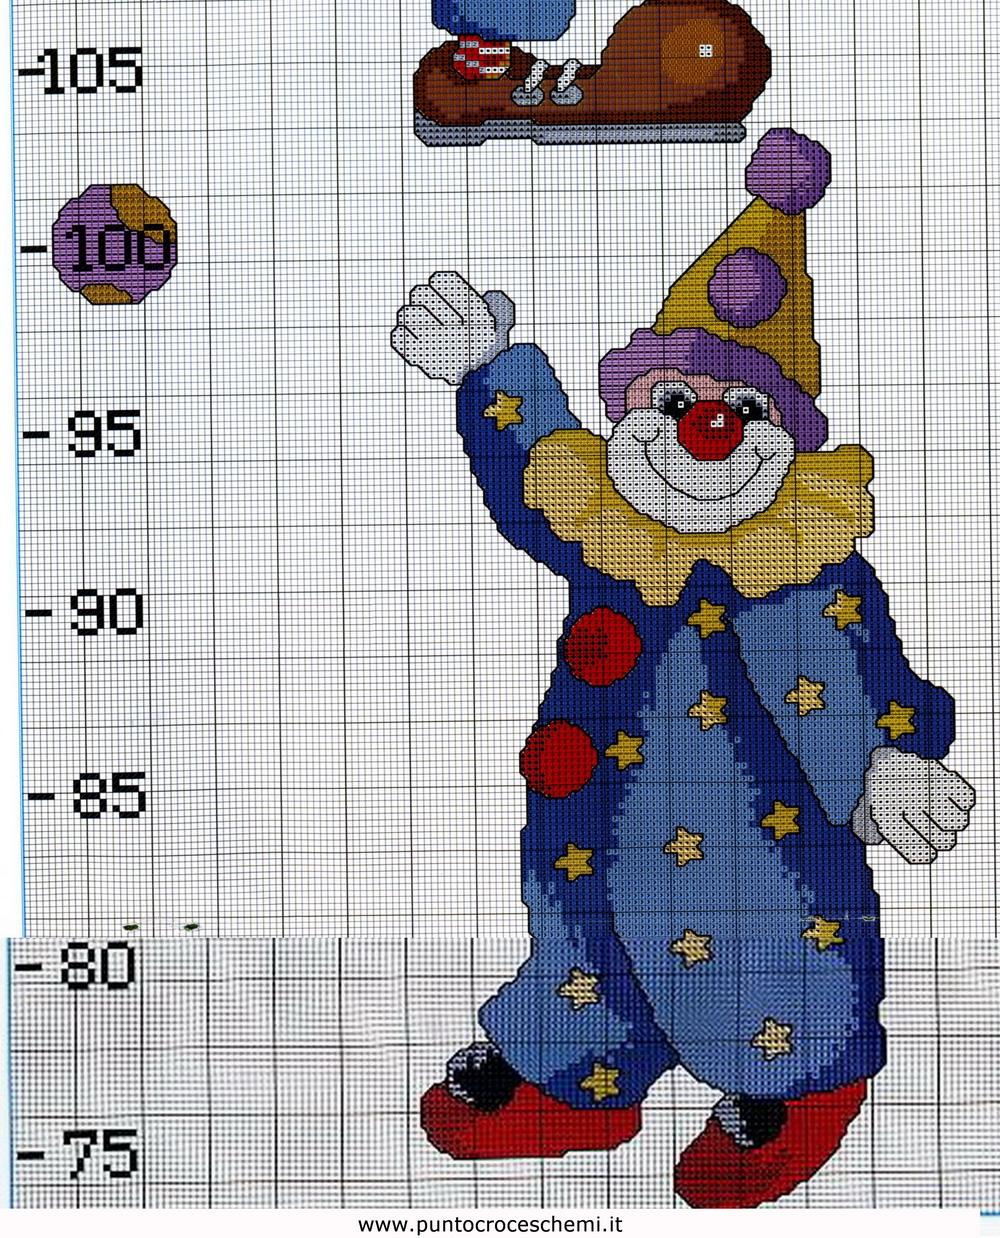 schemi_misti/disegni_bambini2/metro_circo_3.JPG